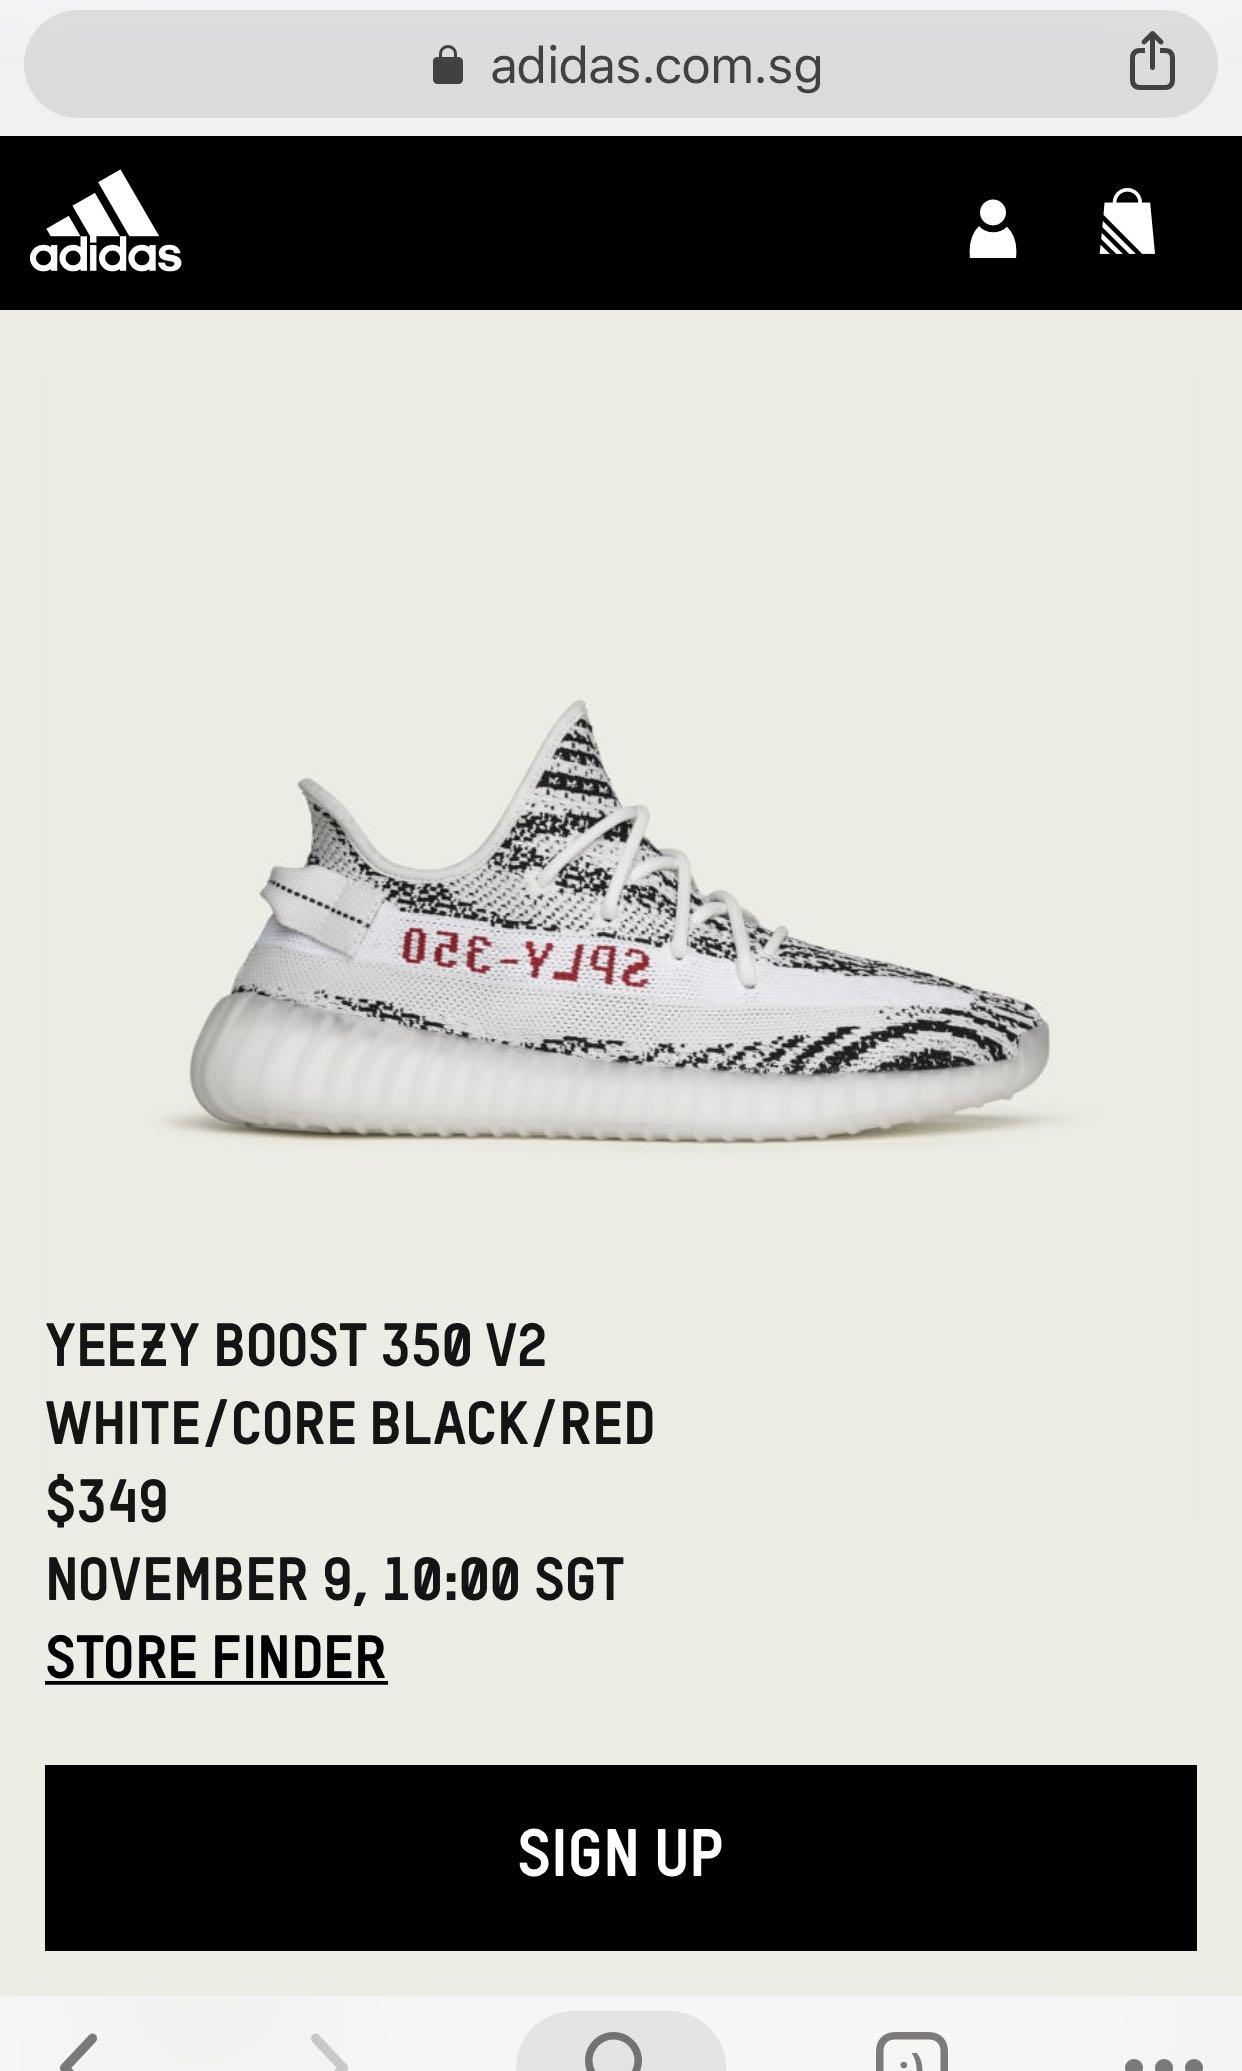 63de674a5 US 10 Yeezy Boost 350 V2 Zebra